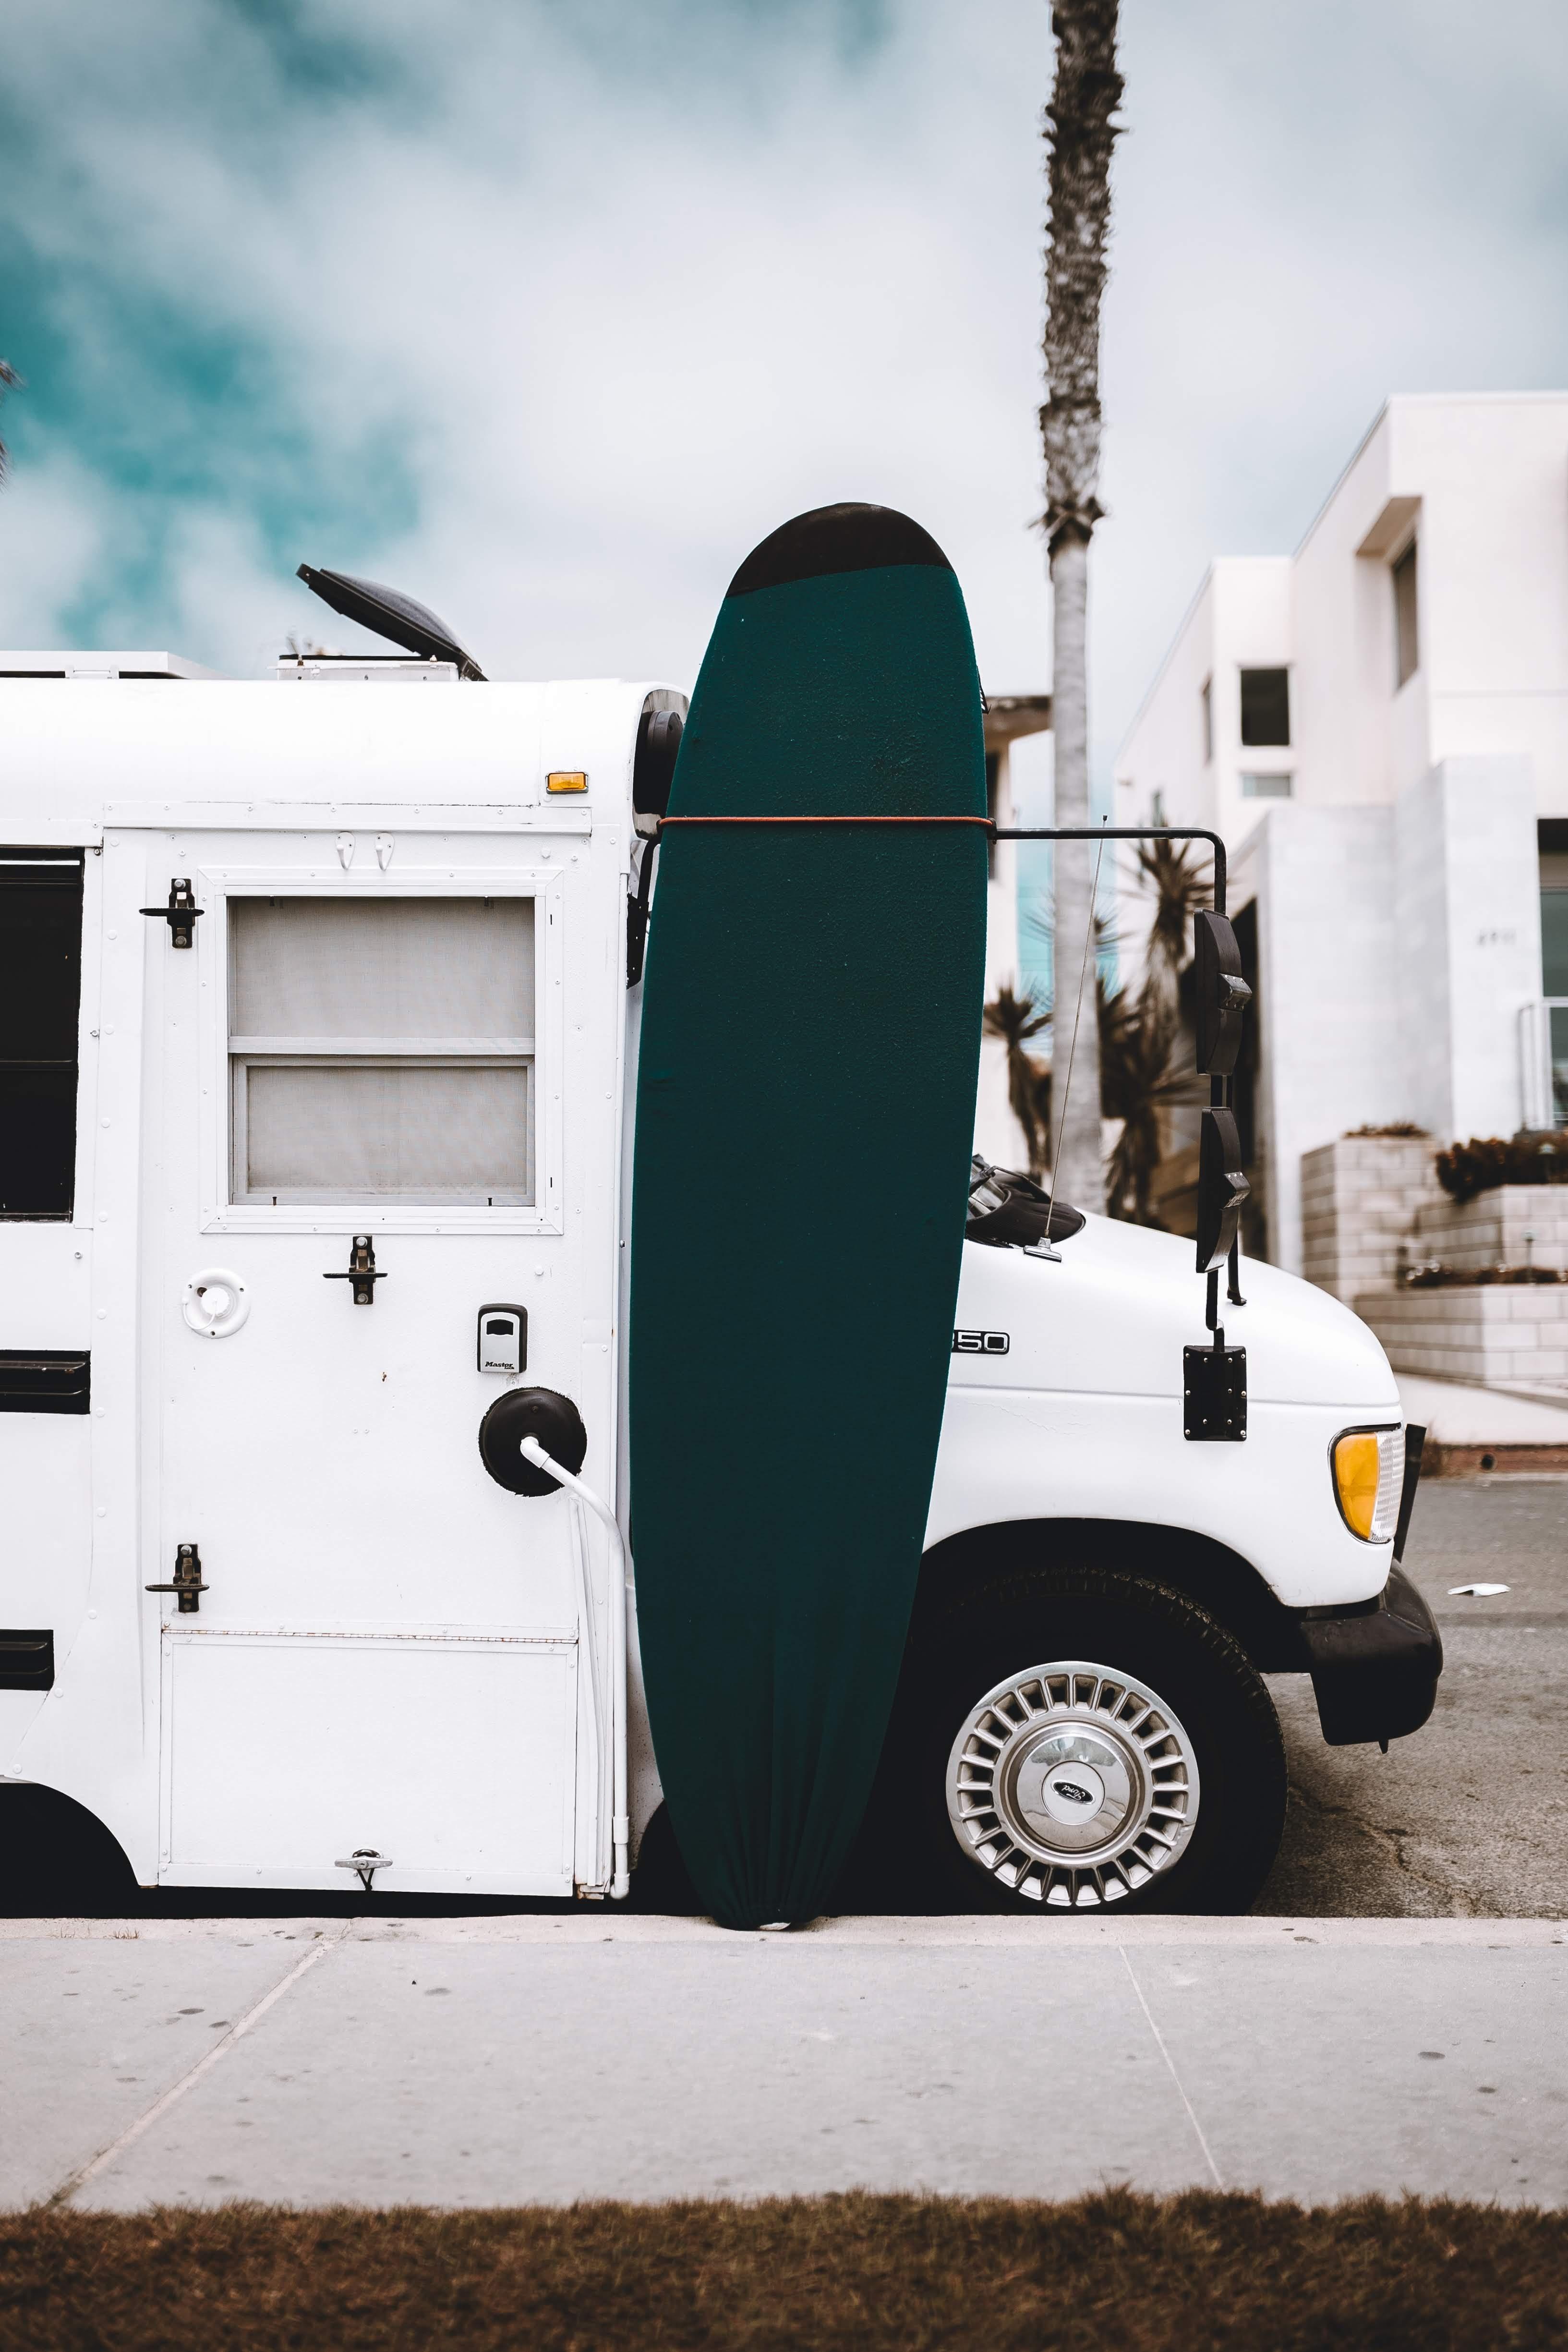 parked white vehicle